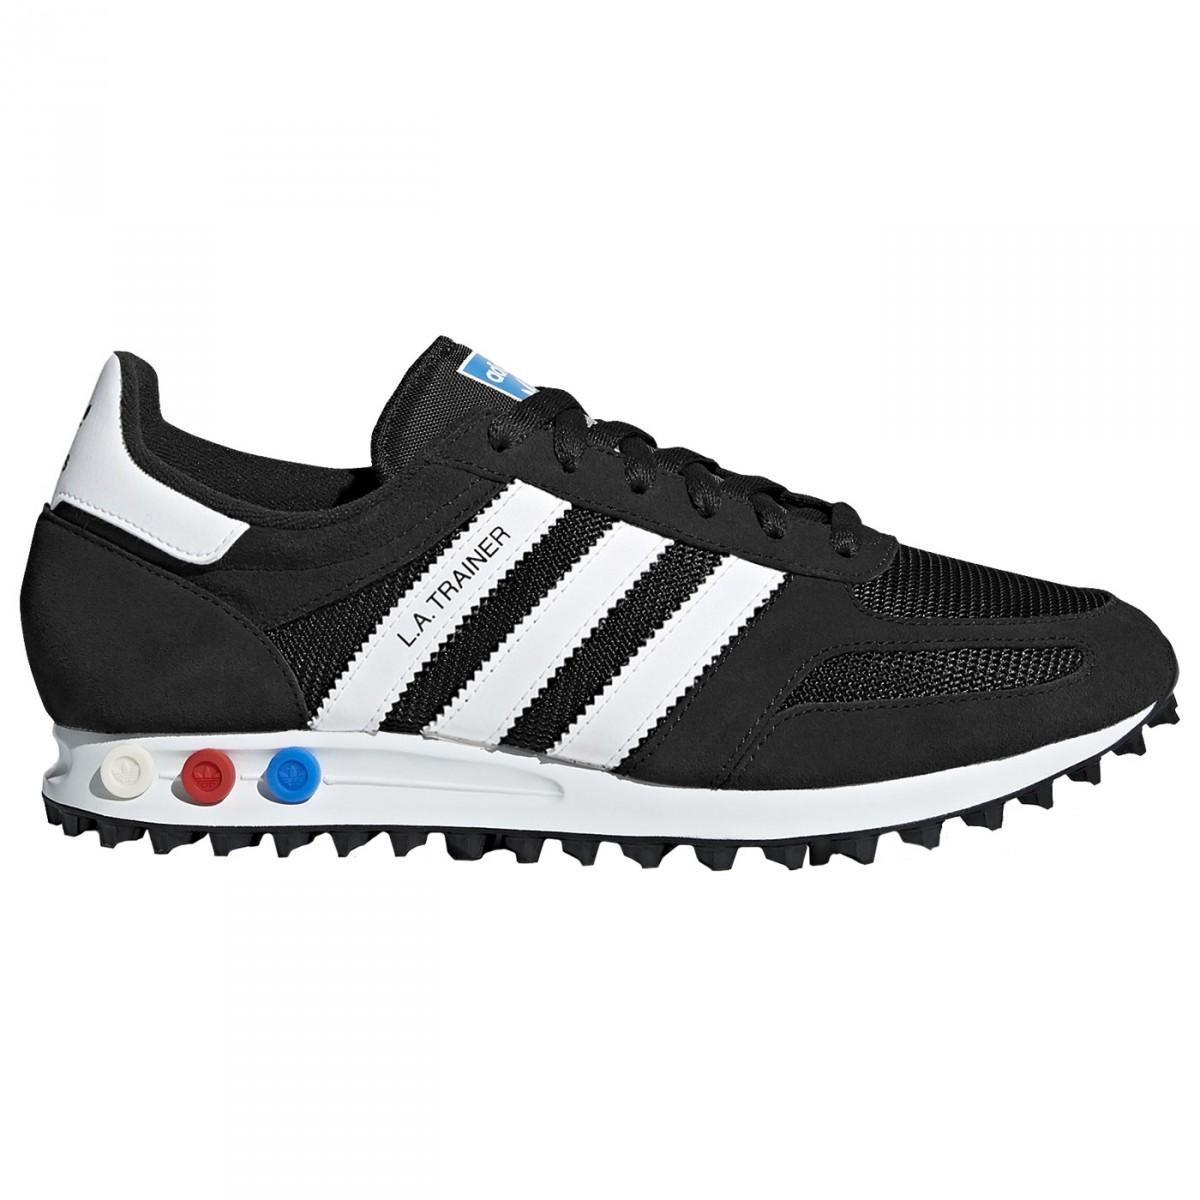 sports shoes e5962 7a57d Sneakers Adidas La Trainer Man black